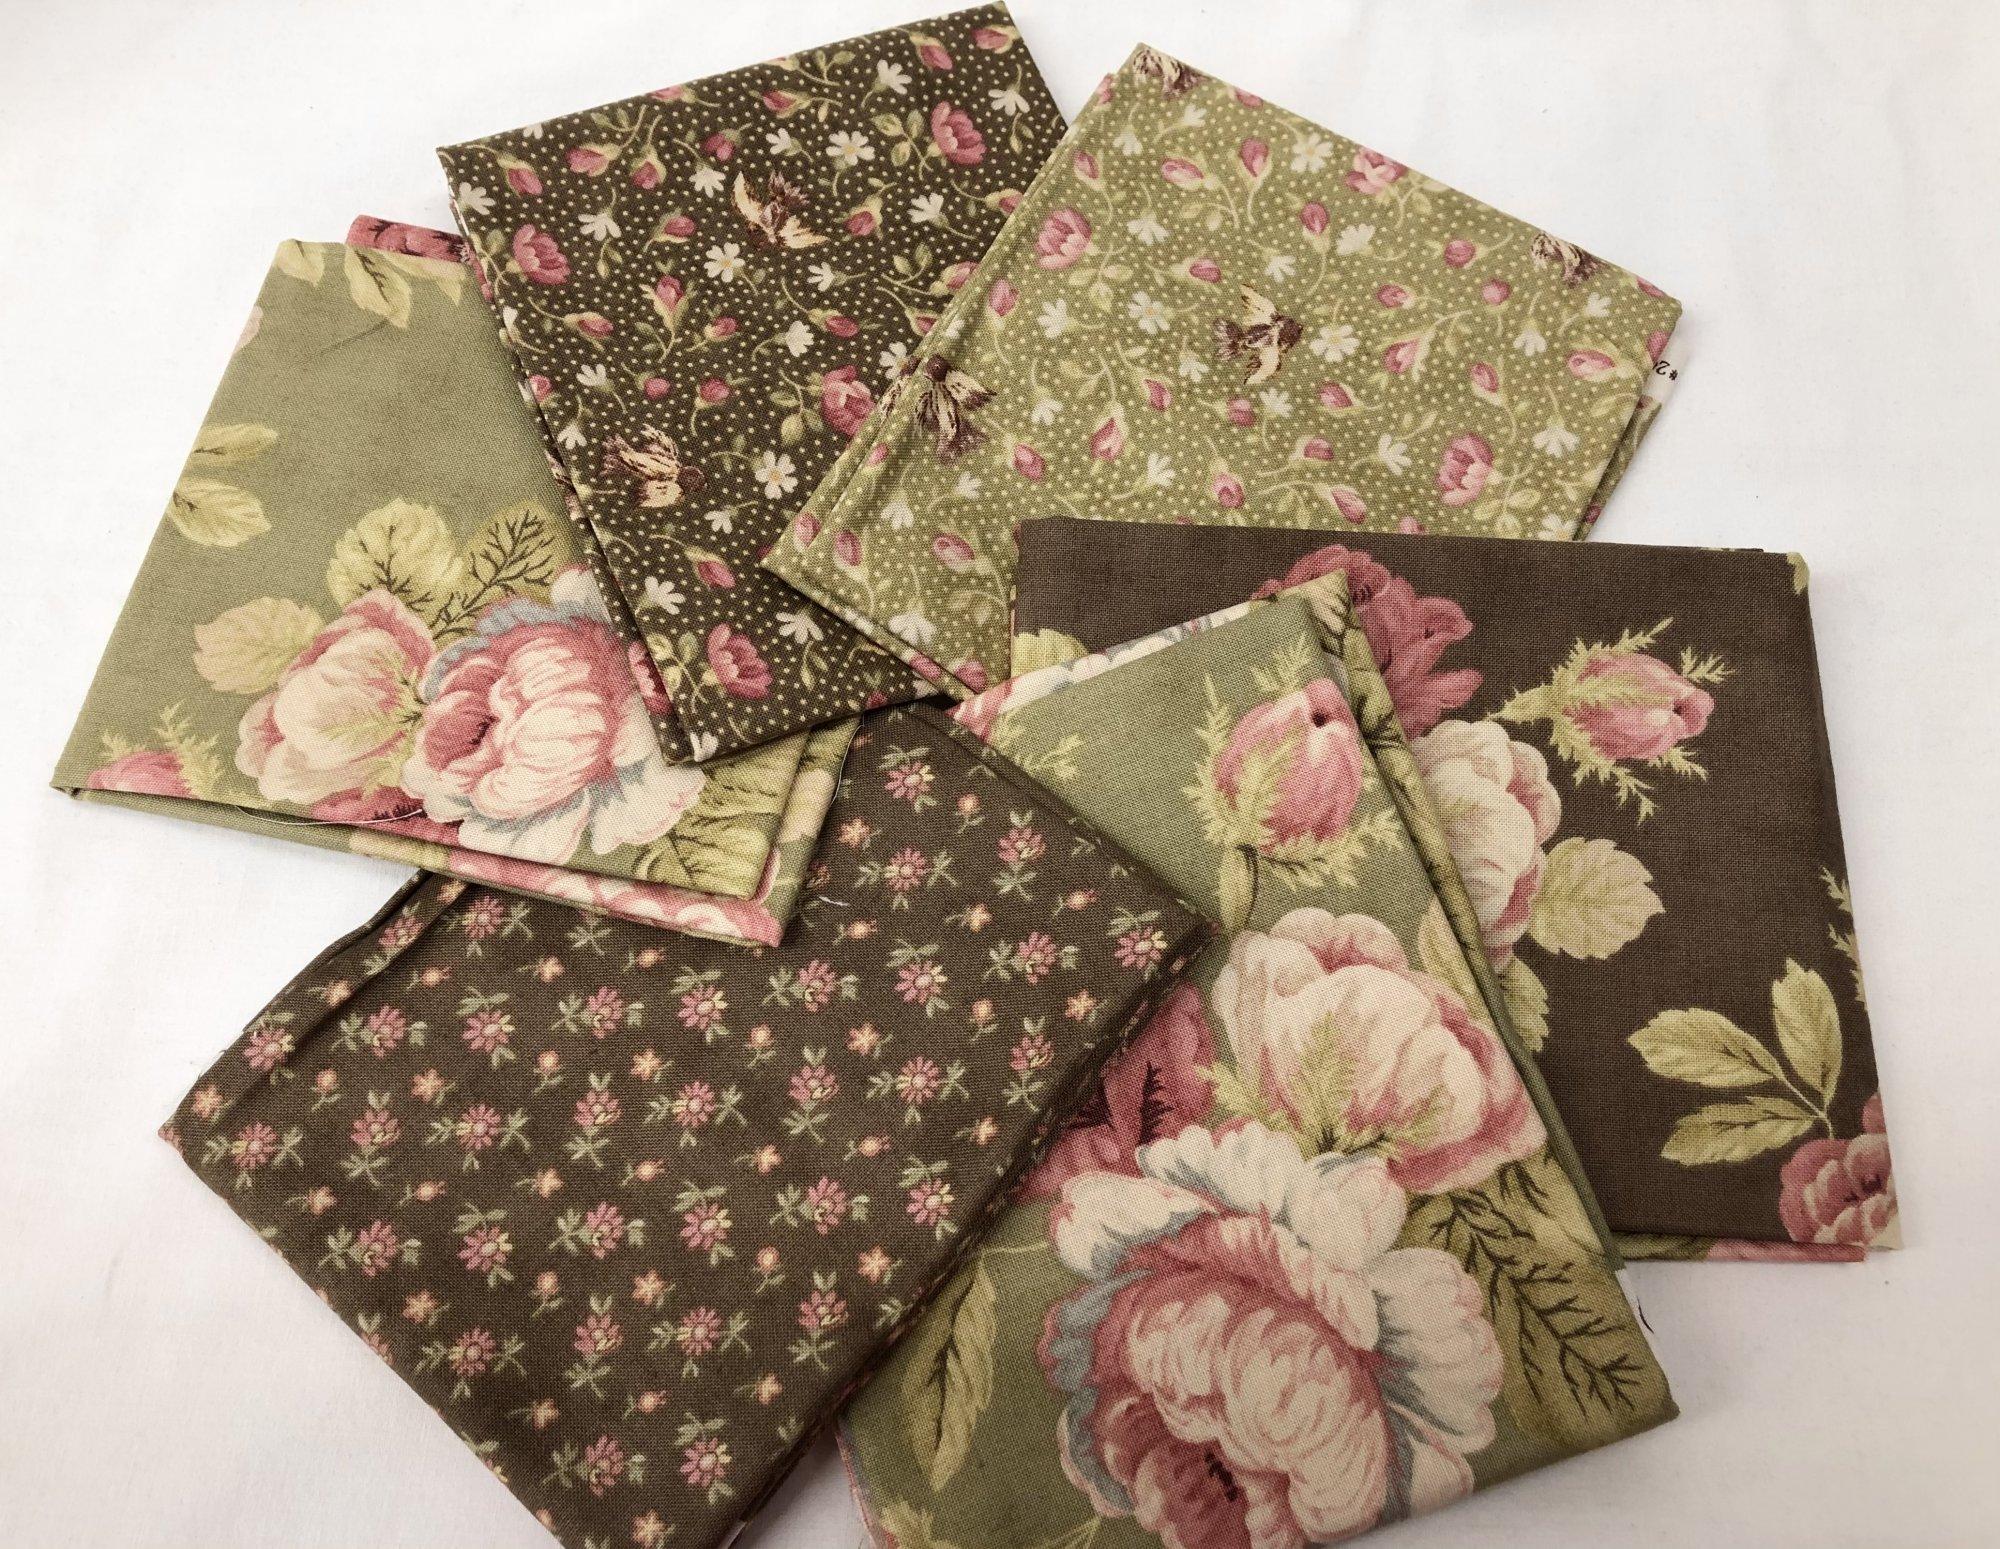 Fat Quarter Pack - 6pcs/bundle - In store - Moda Garden Party by Black Bird Designs